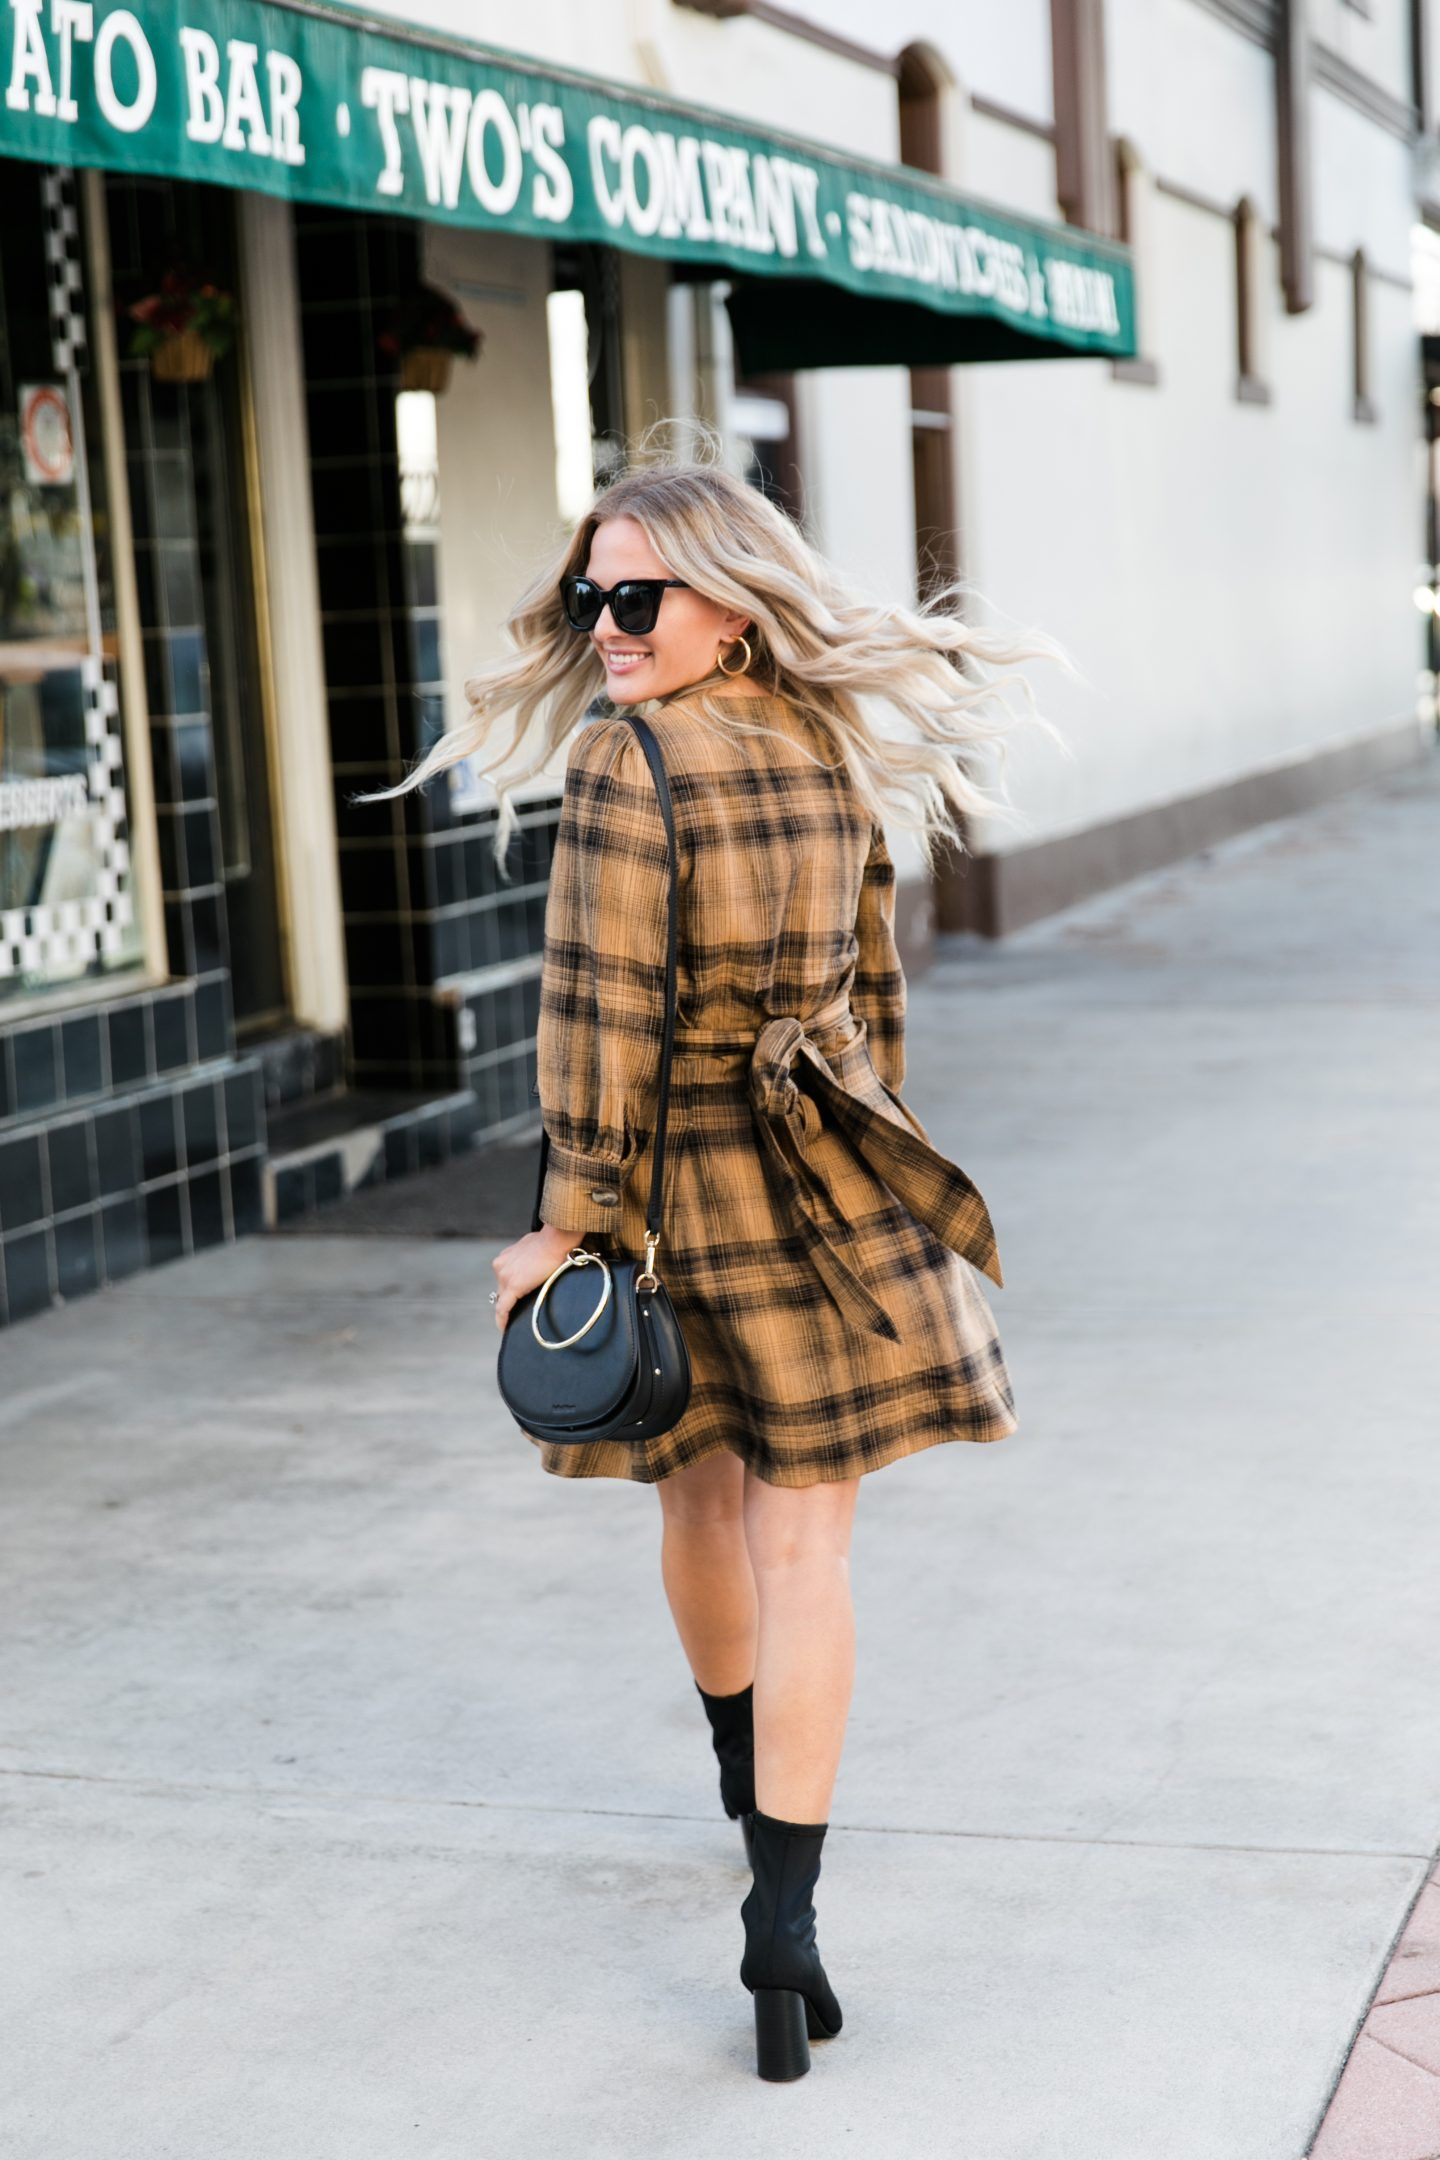 Cute Free People Plaid Dress for Fall  Fashion  Dress Me Blonde